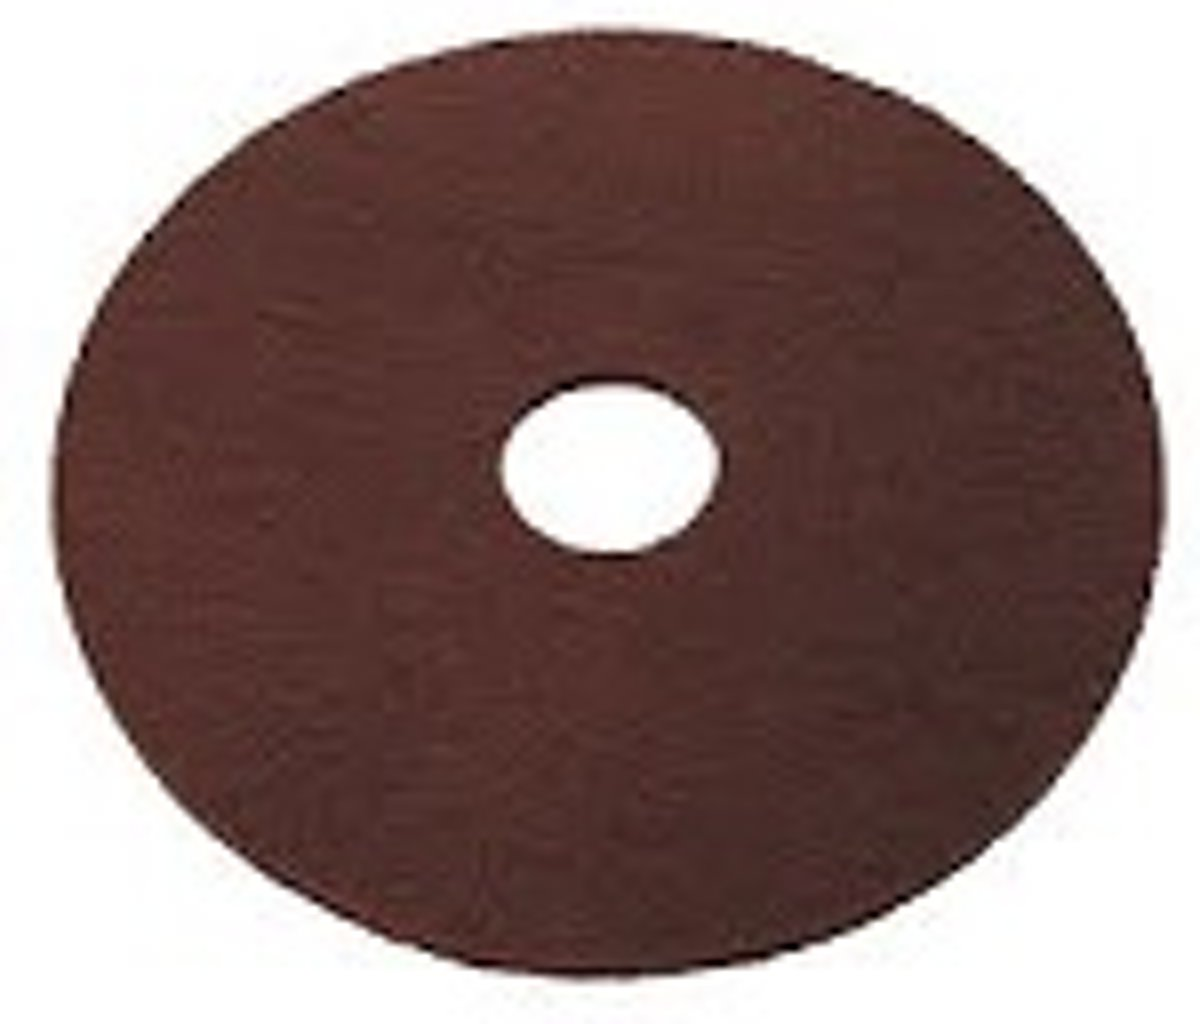 Nylon Pads Beige - 40 CM, 2 CM, 16 inch (High Quality) kopen